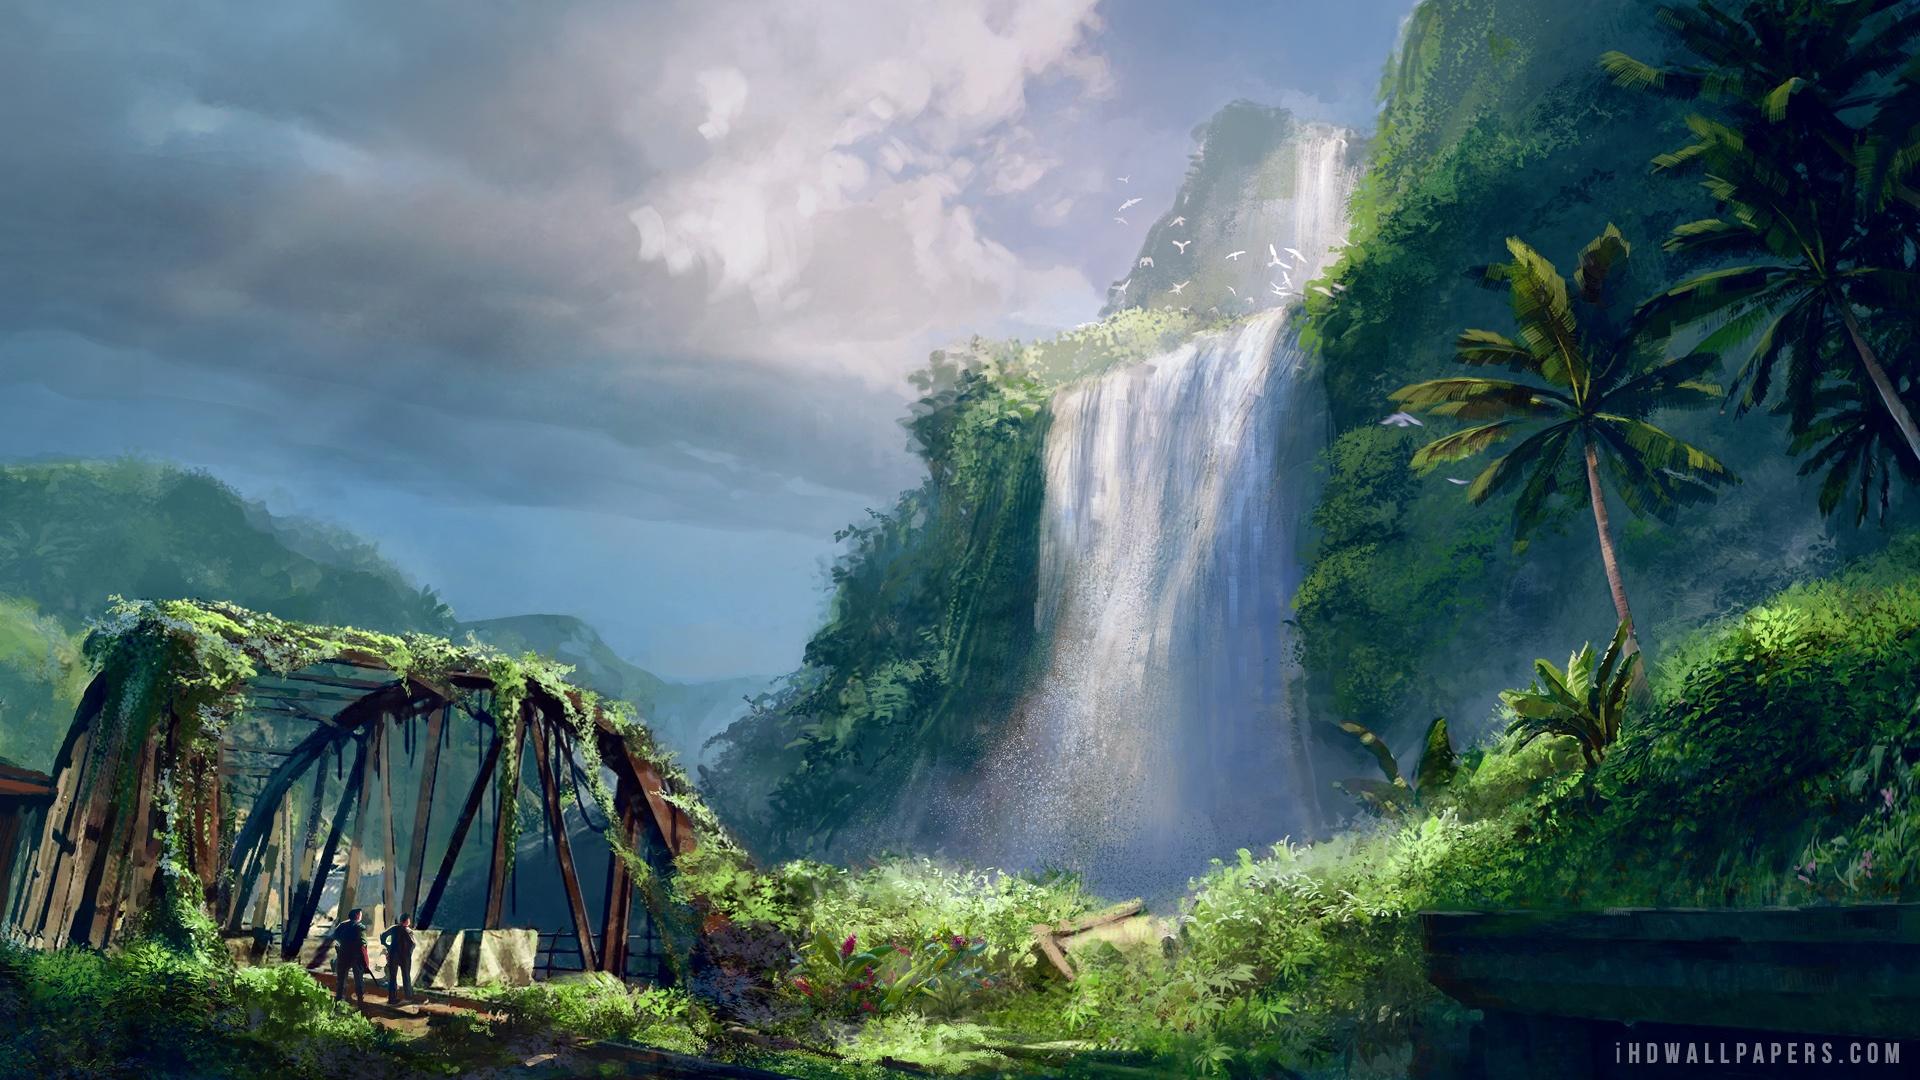 Far Cry 5 Wallpaper Hd: Far Cry 3 HD Wallpapers